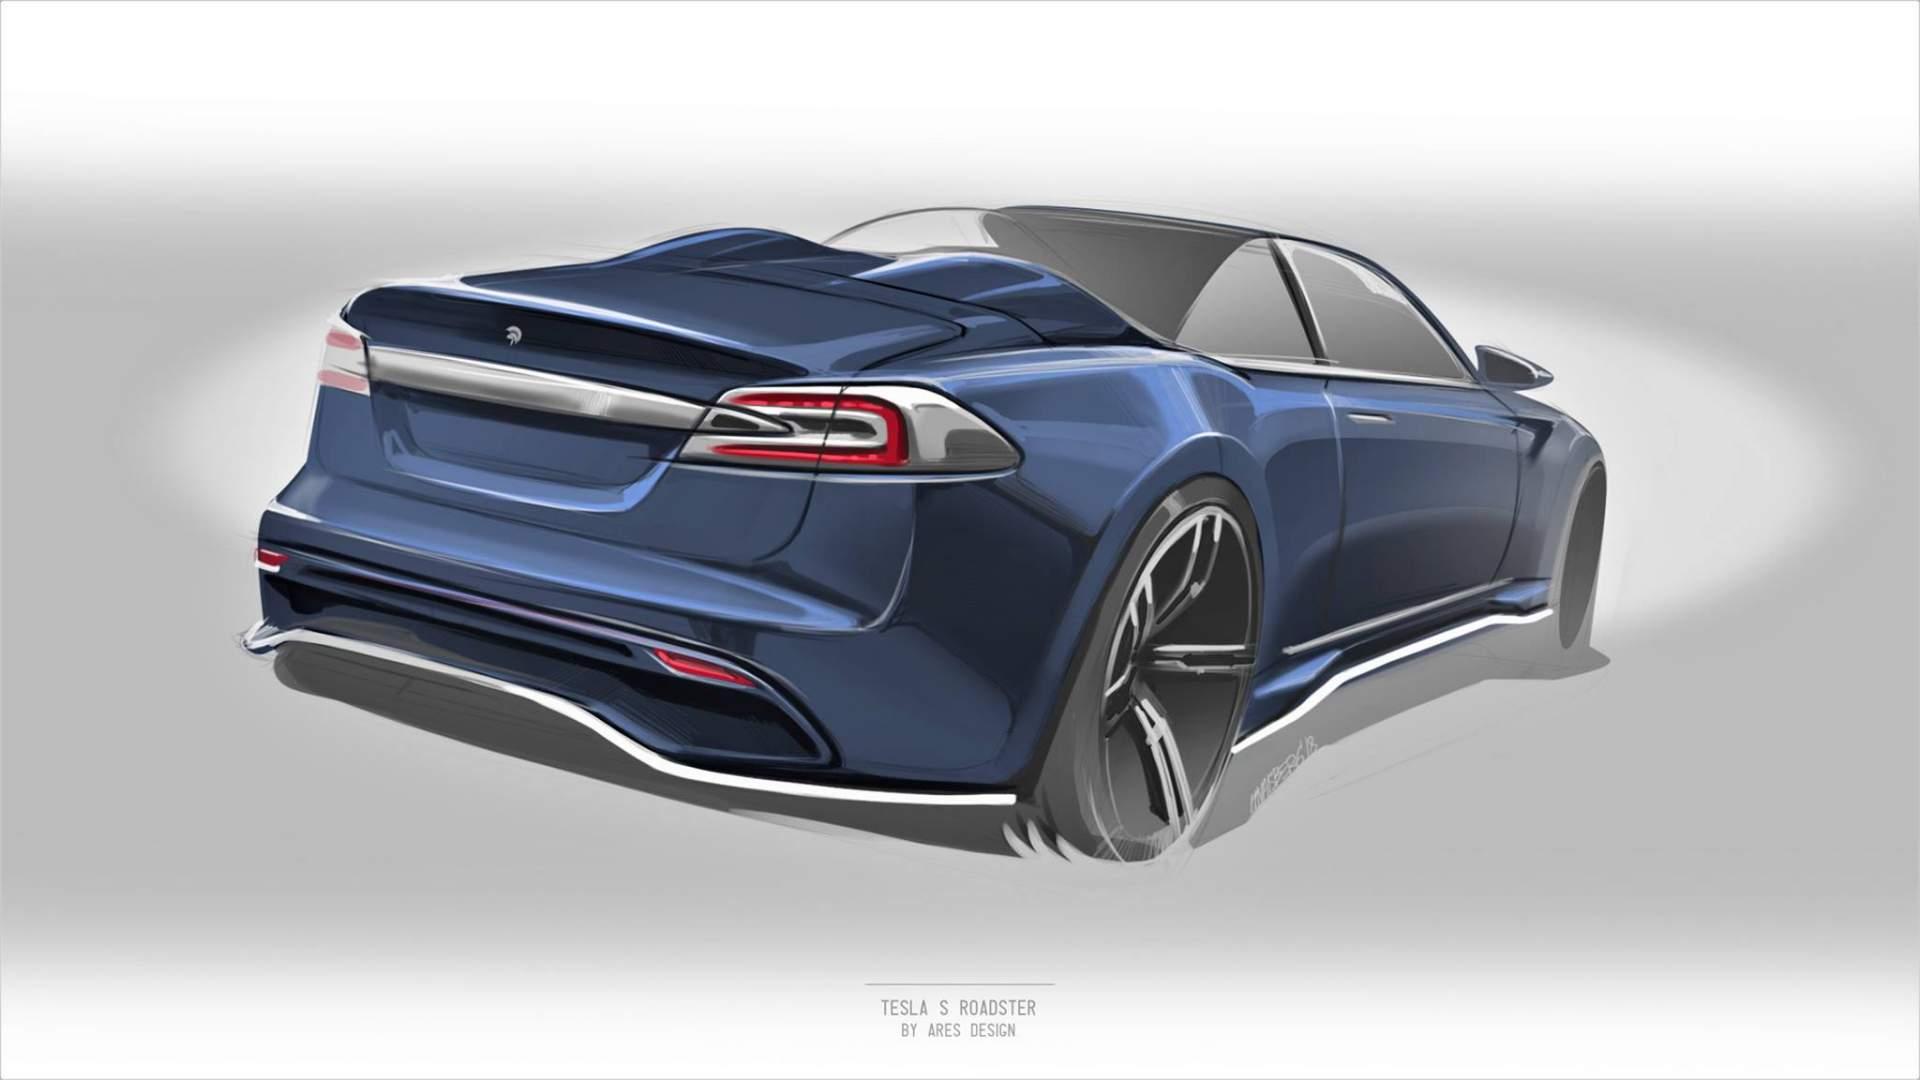 Ares Design построит родстер на базе Tesla Model S